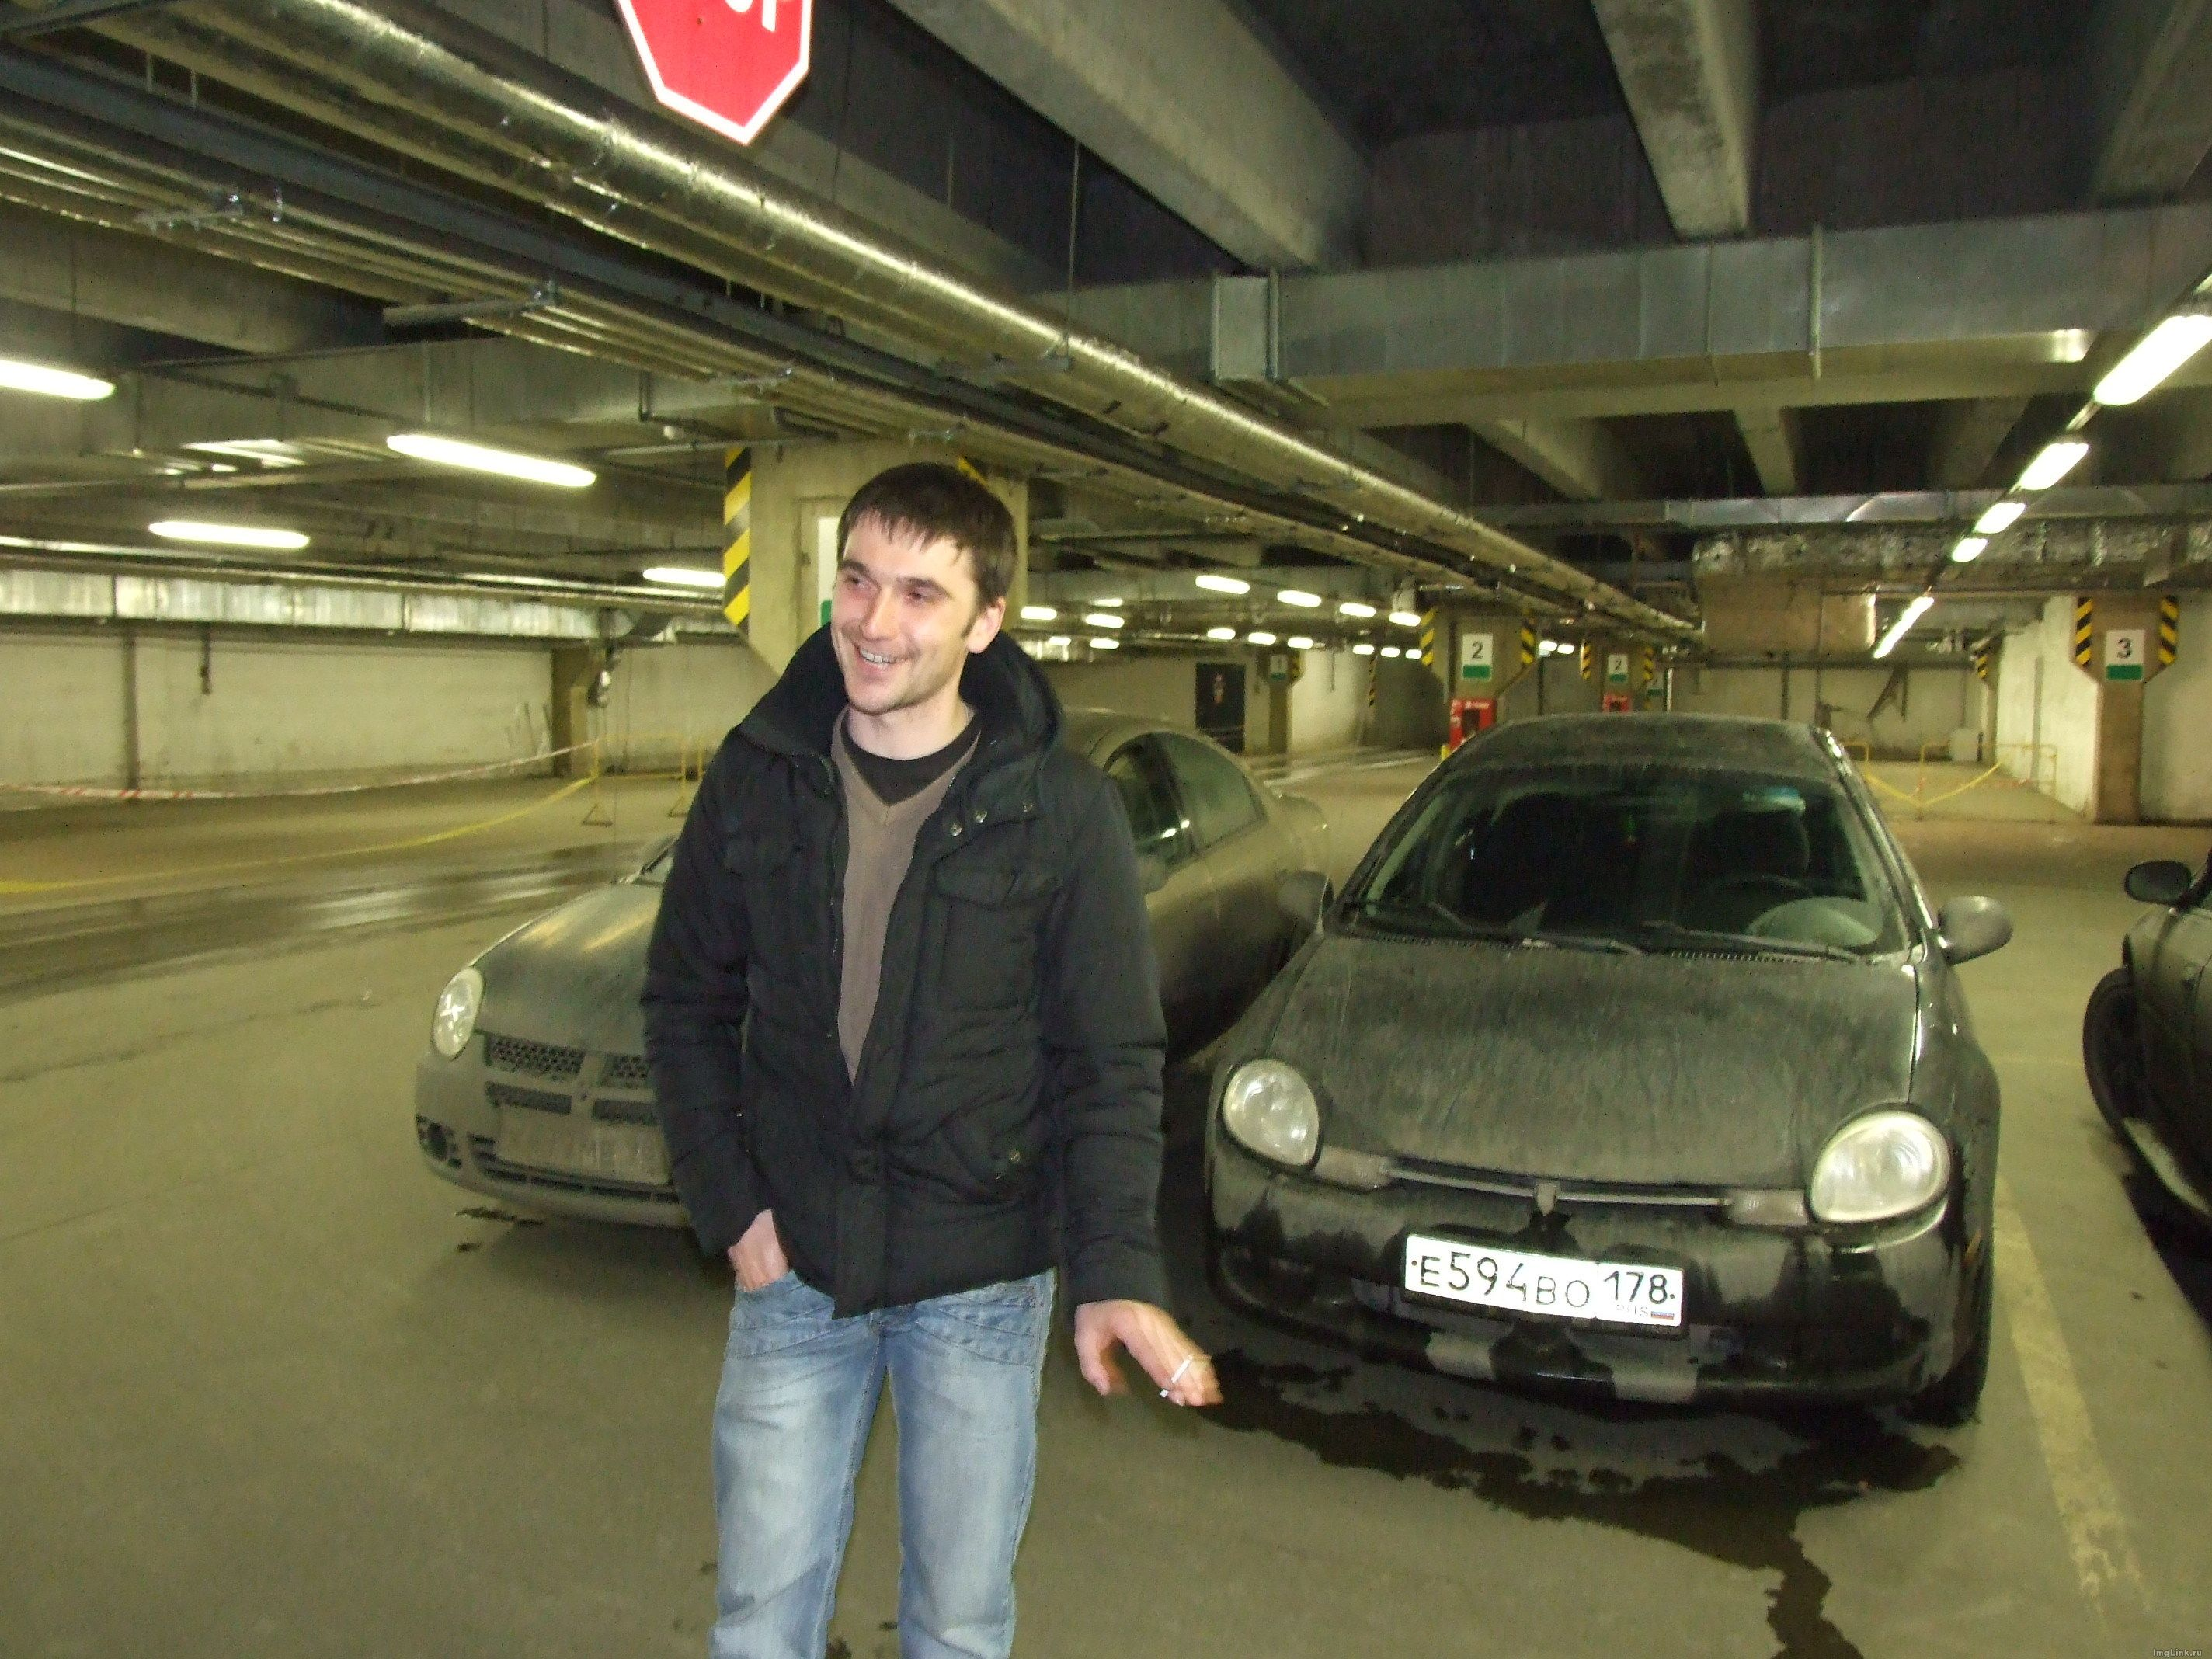 http://imglink.ru/pictures/29-03-11/3dc54424be85d552bb9f83f93f6ce4b1.jpg